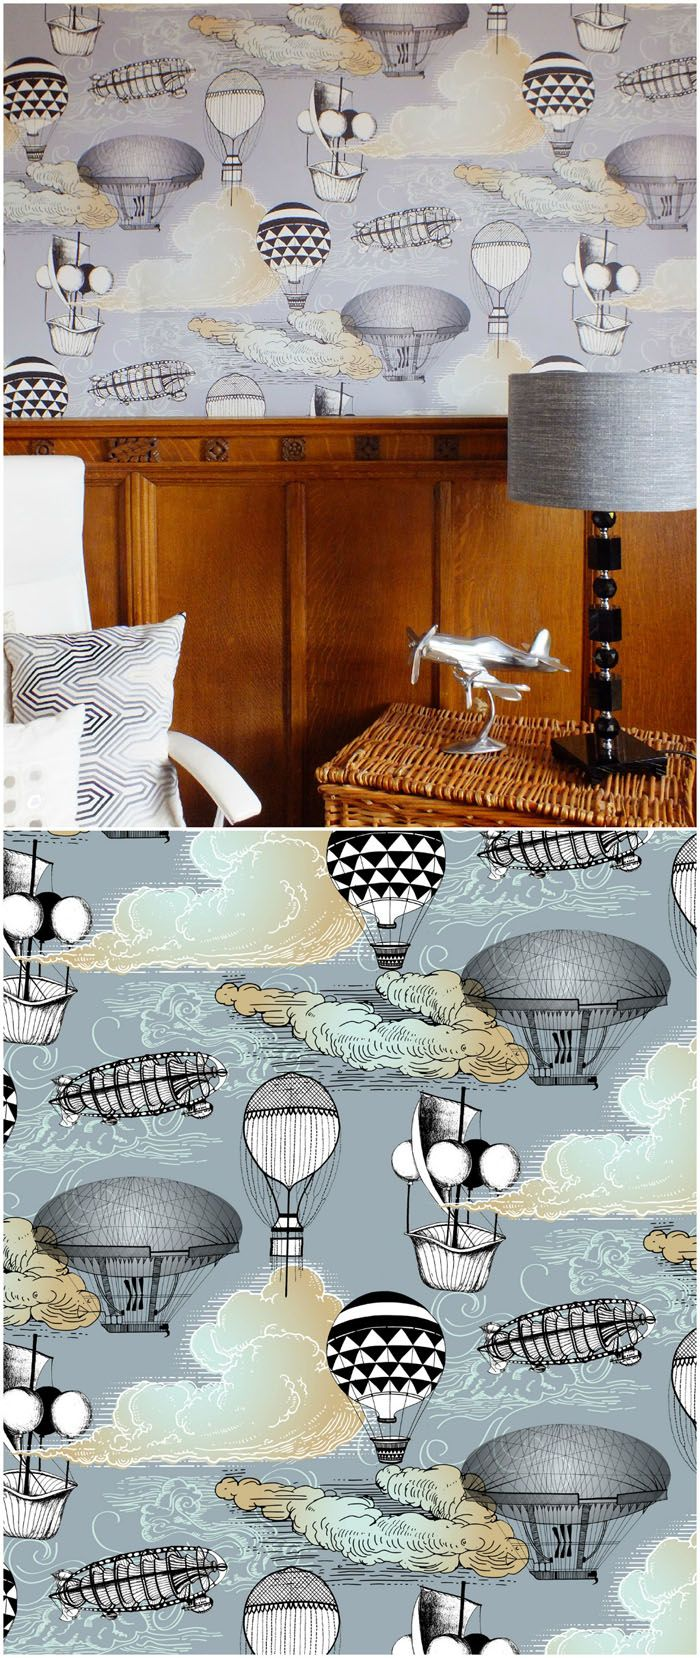 Aeronaut Wallpaper designed by Kate Usher